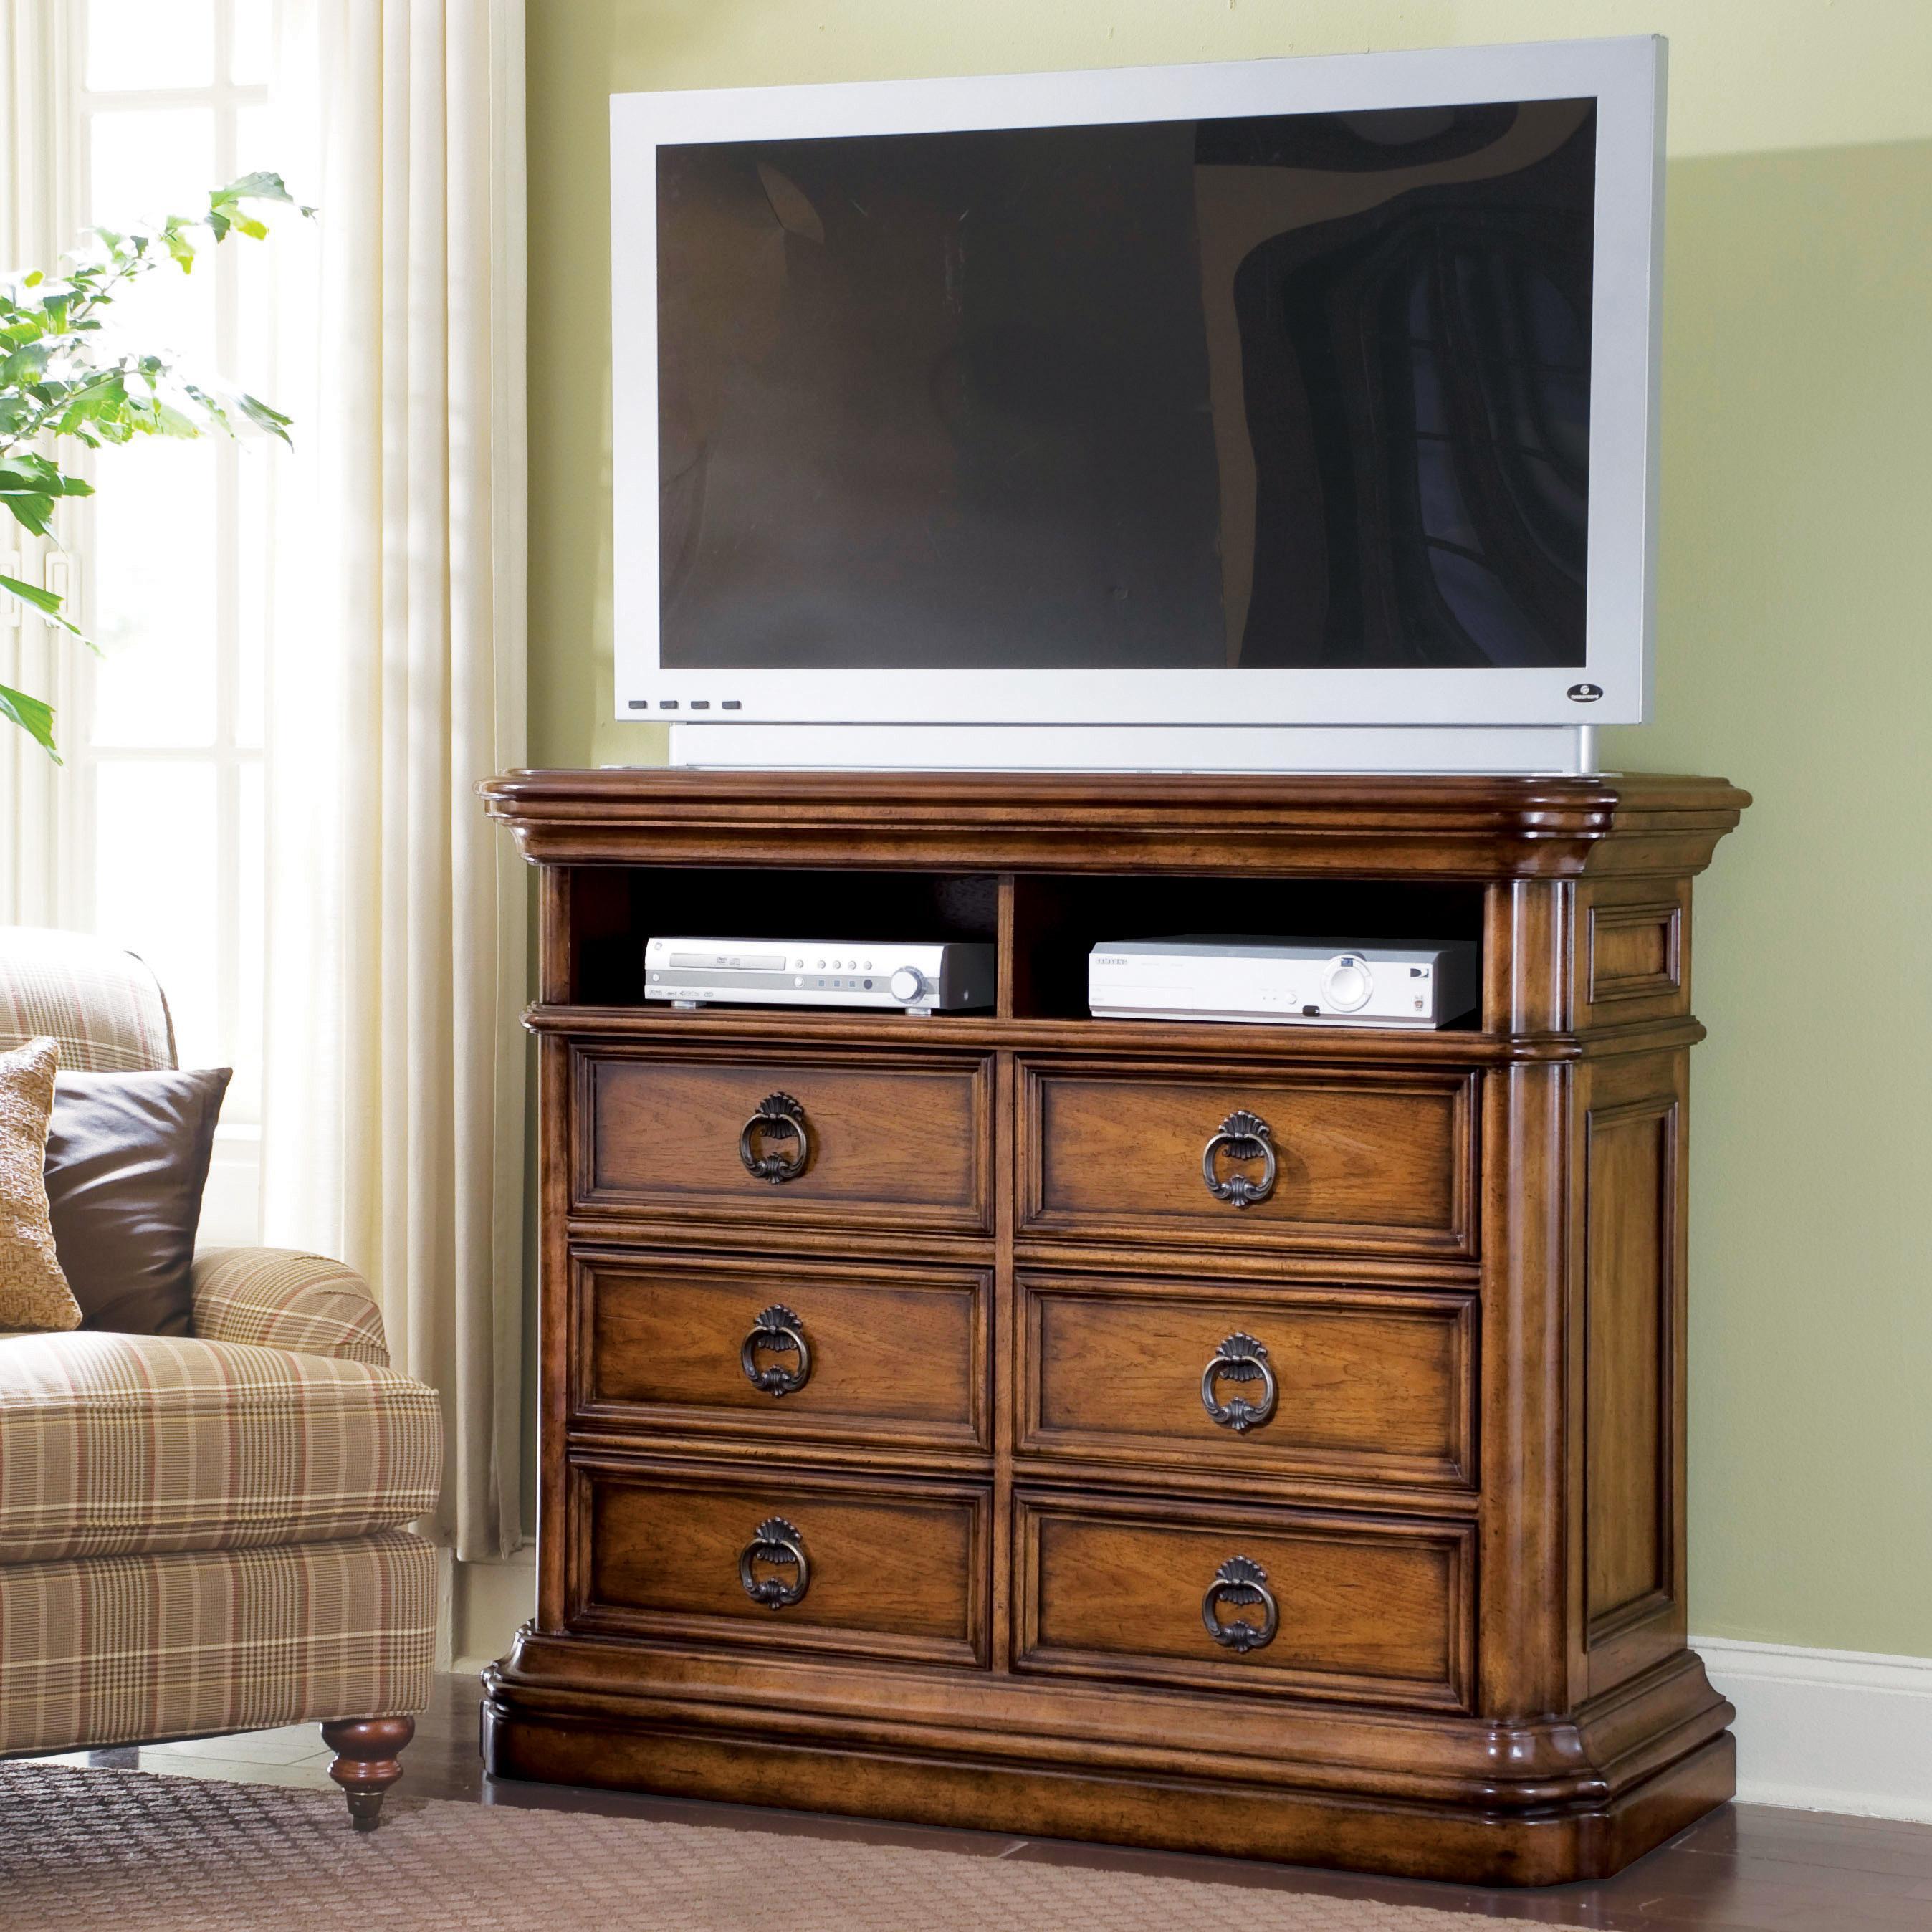 San Mateo Media Chest by Pulaski Furniture at Alison Craig Home Furnishings